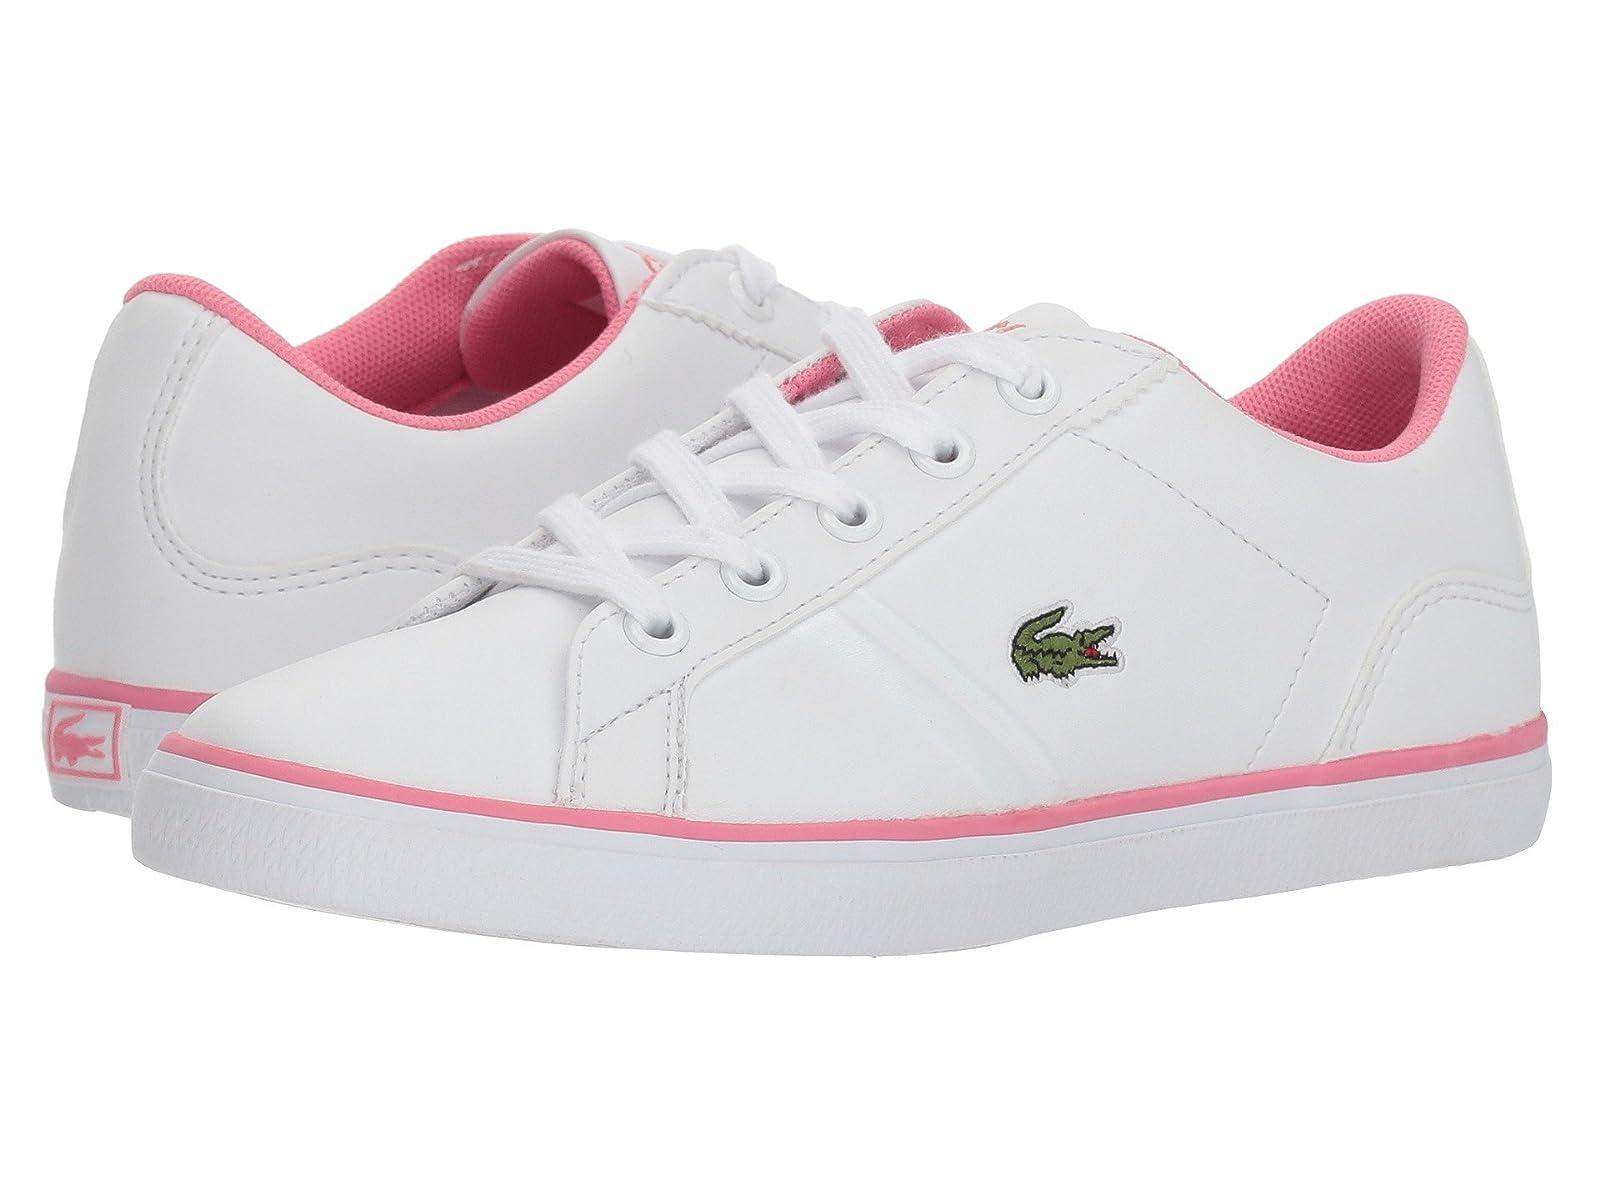 Lacoste Kids Lerond (Little Kid)Atmospheric grades have affordable shoes